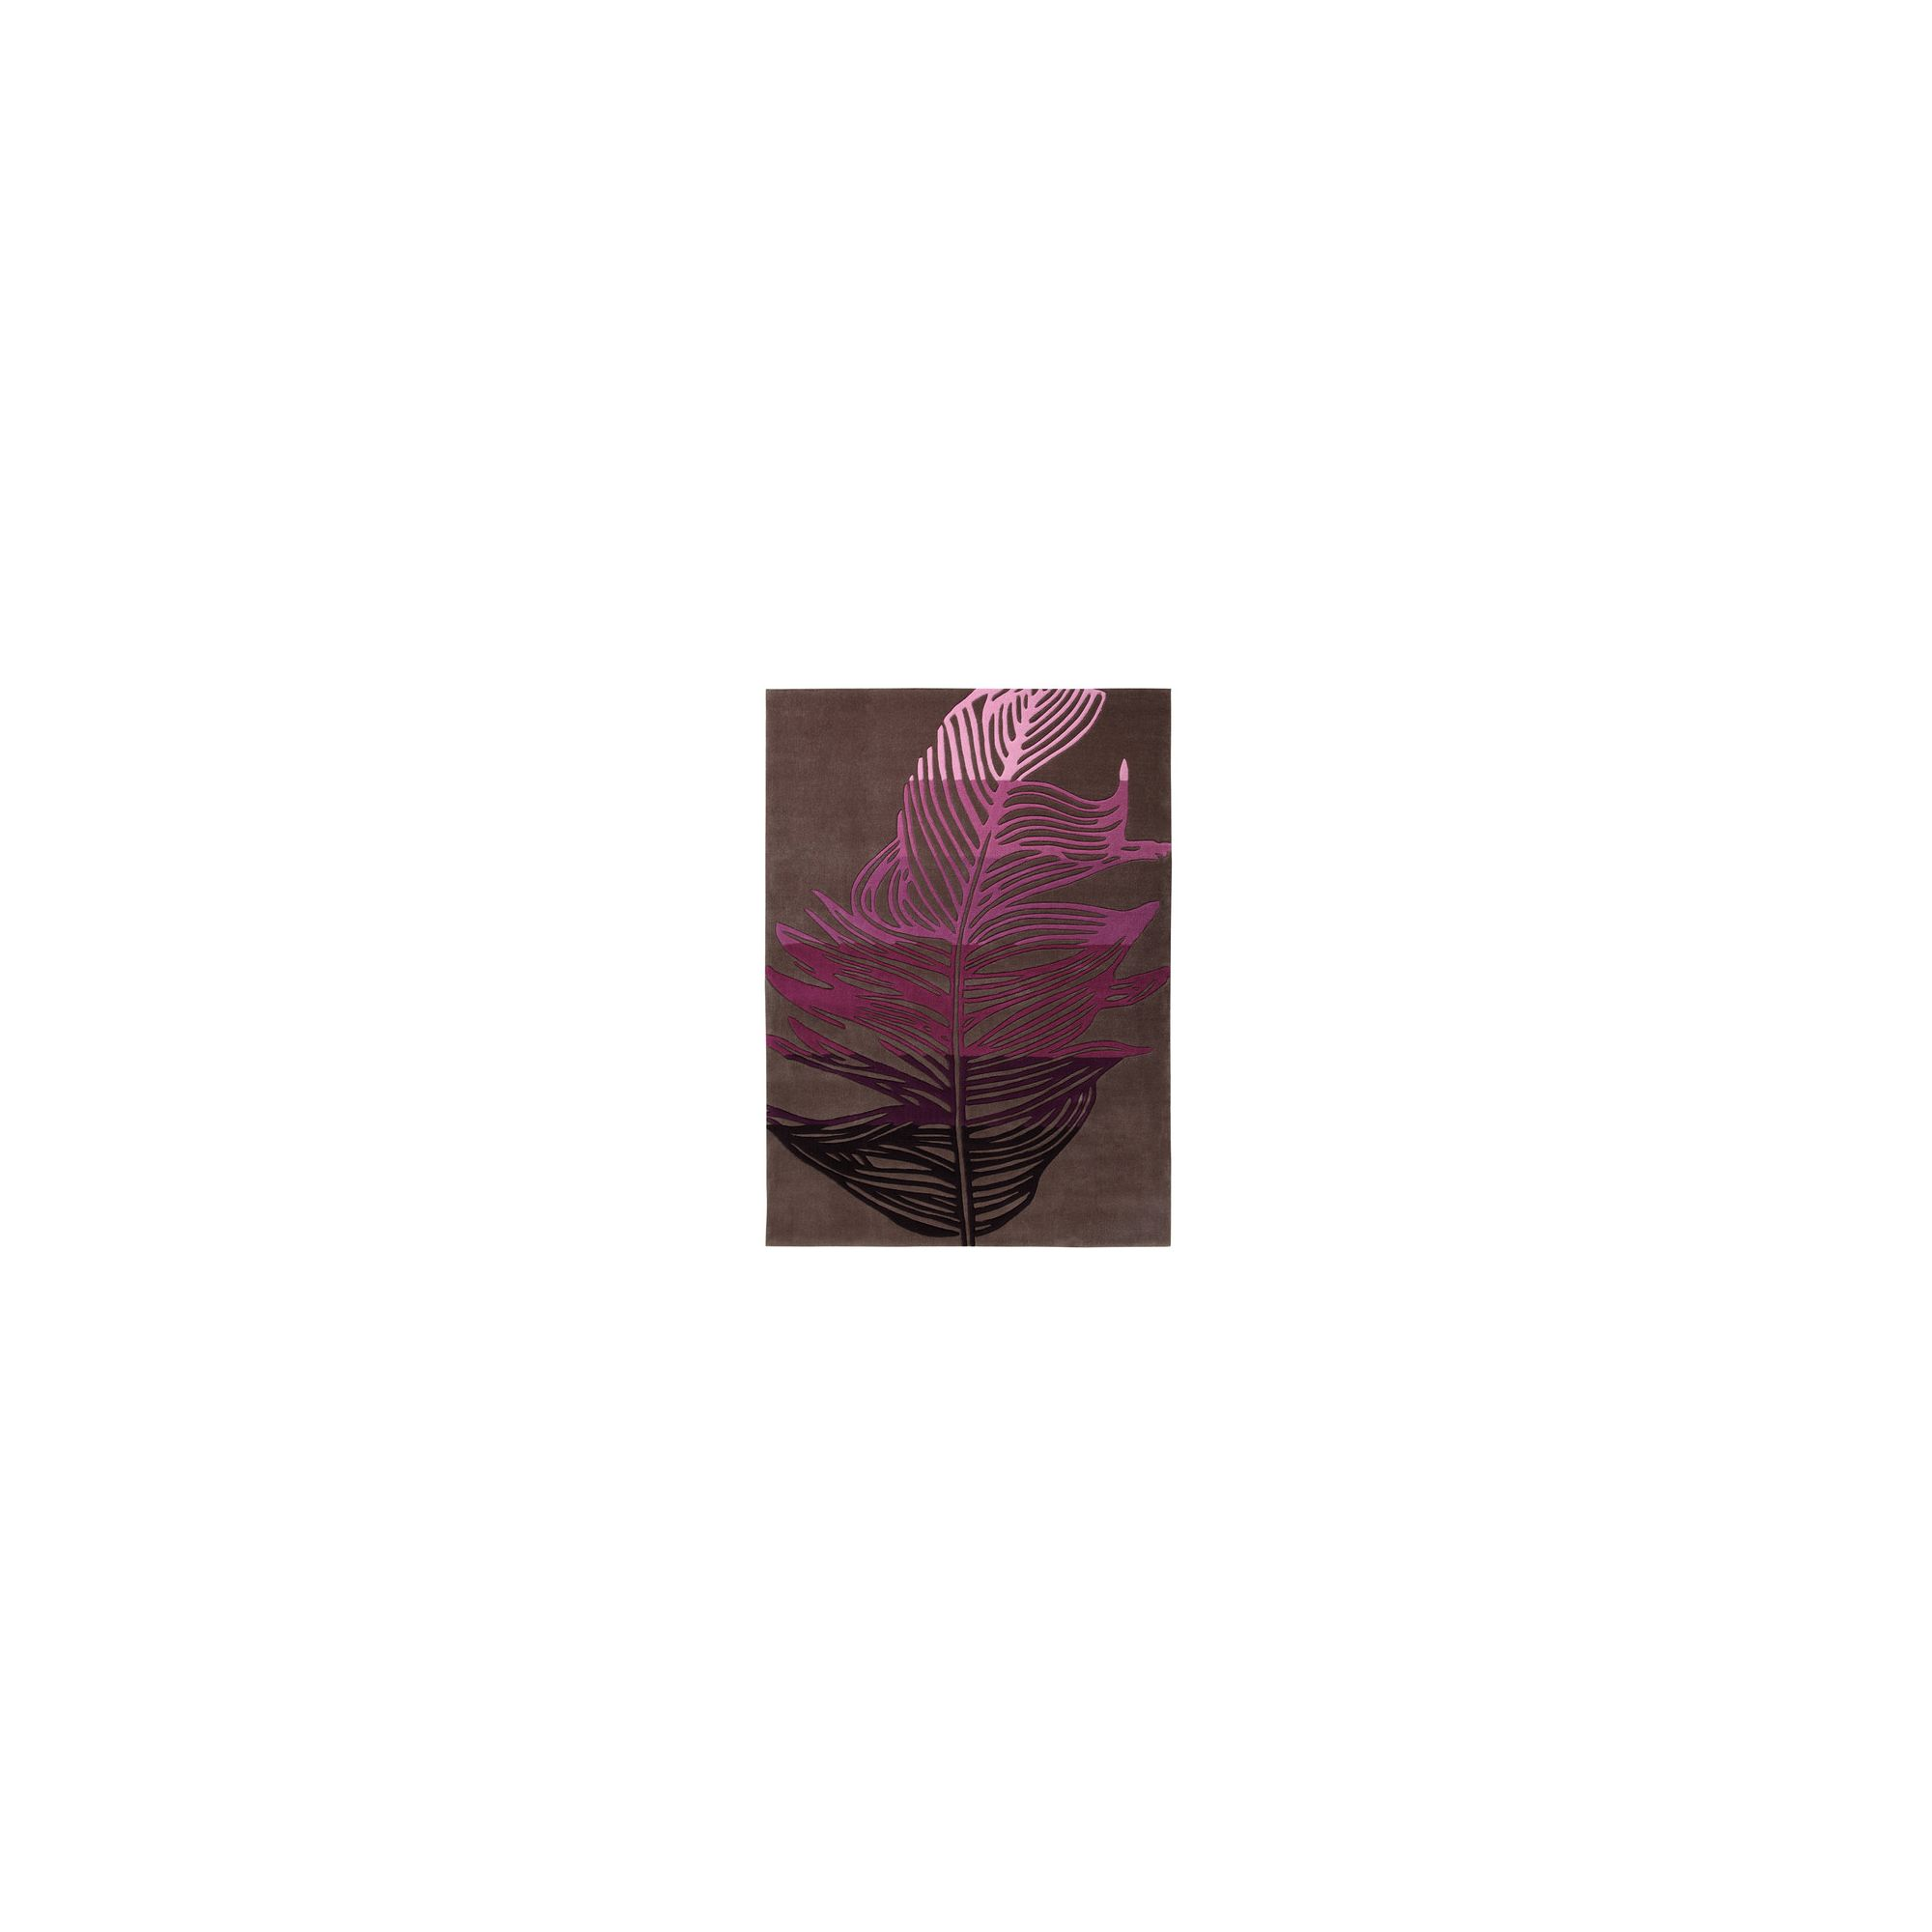 Esprit Feather Brown / Purple Novelty Rug - 170cm x 240cm